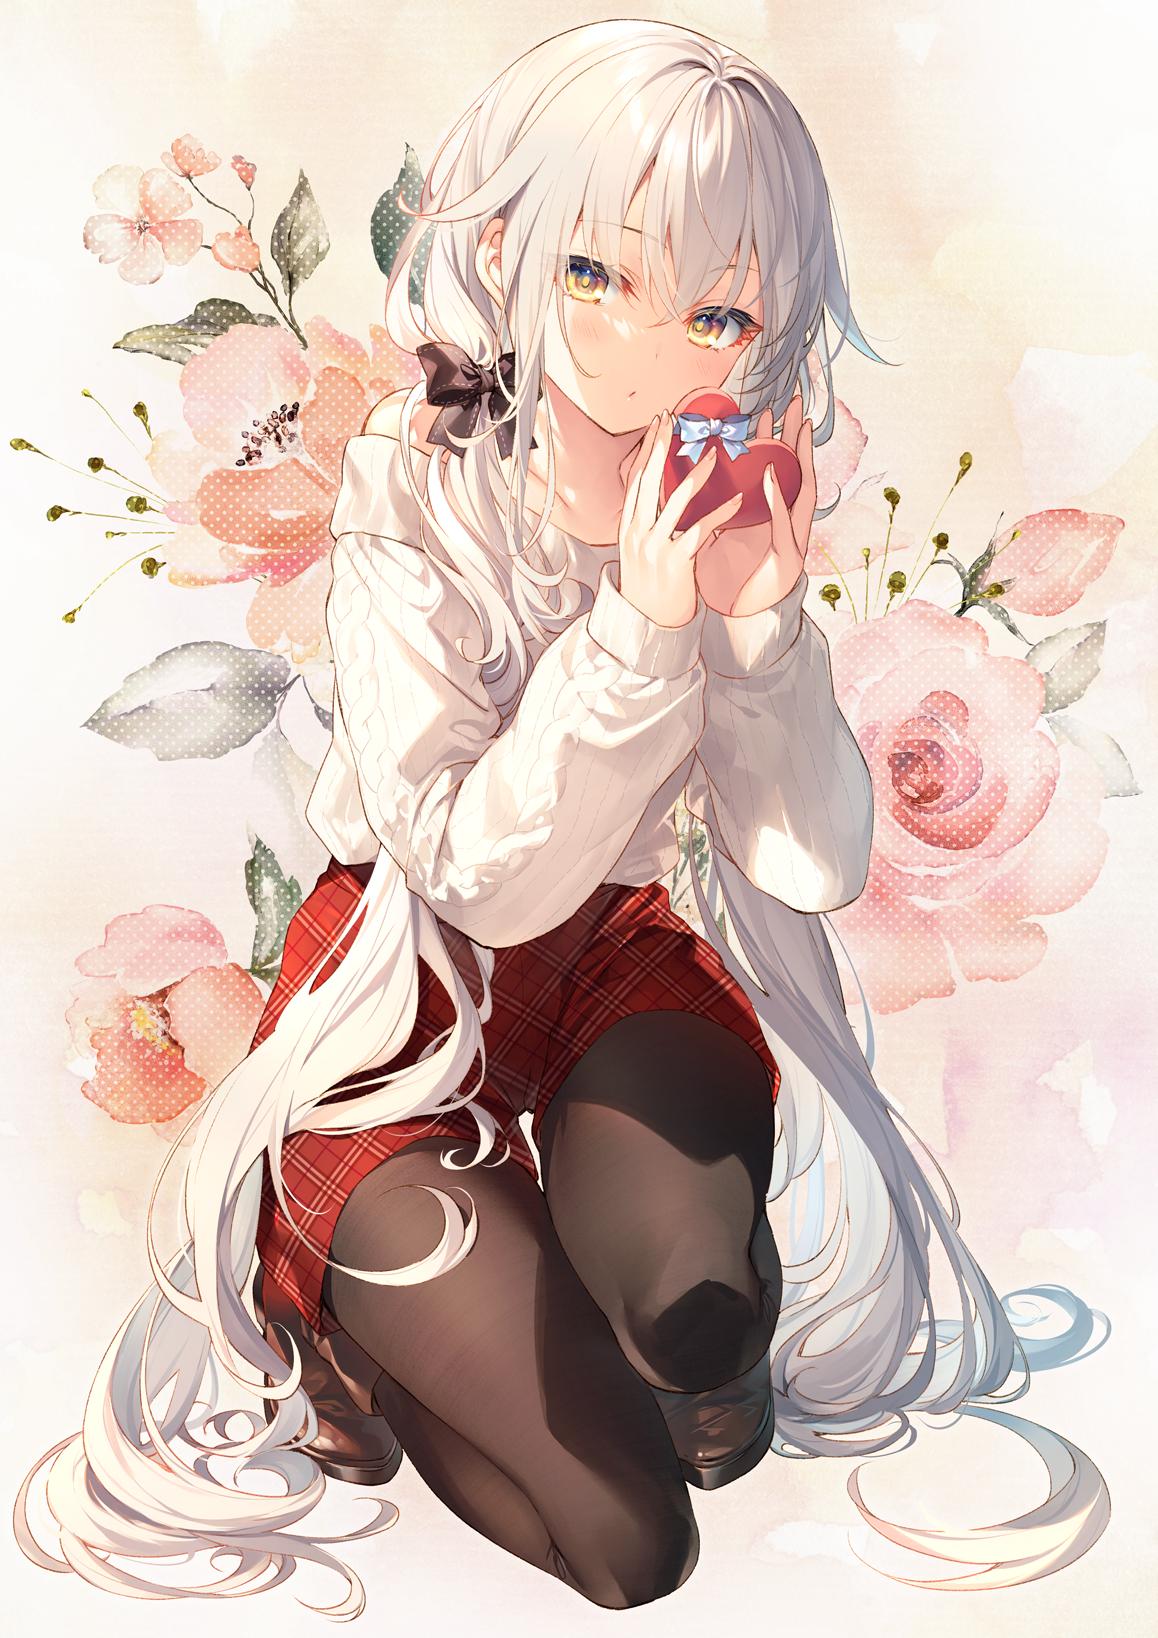 Anime 1158x1638 bangs gift hair bows kneeling long hair long sleeves looking at viewer pantyhose sweater twintails Valentine's Day white hair white sweater yellow eyes Toosaka Asagi shorts anime girls